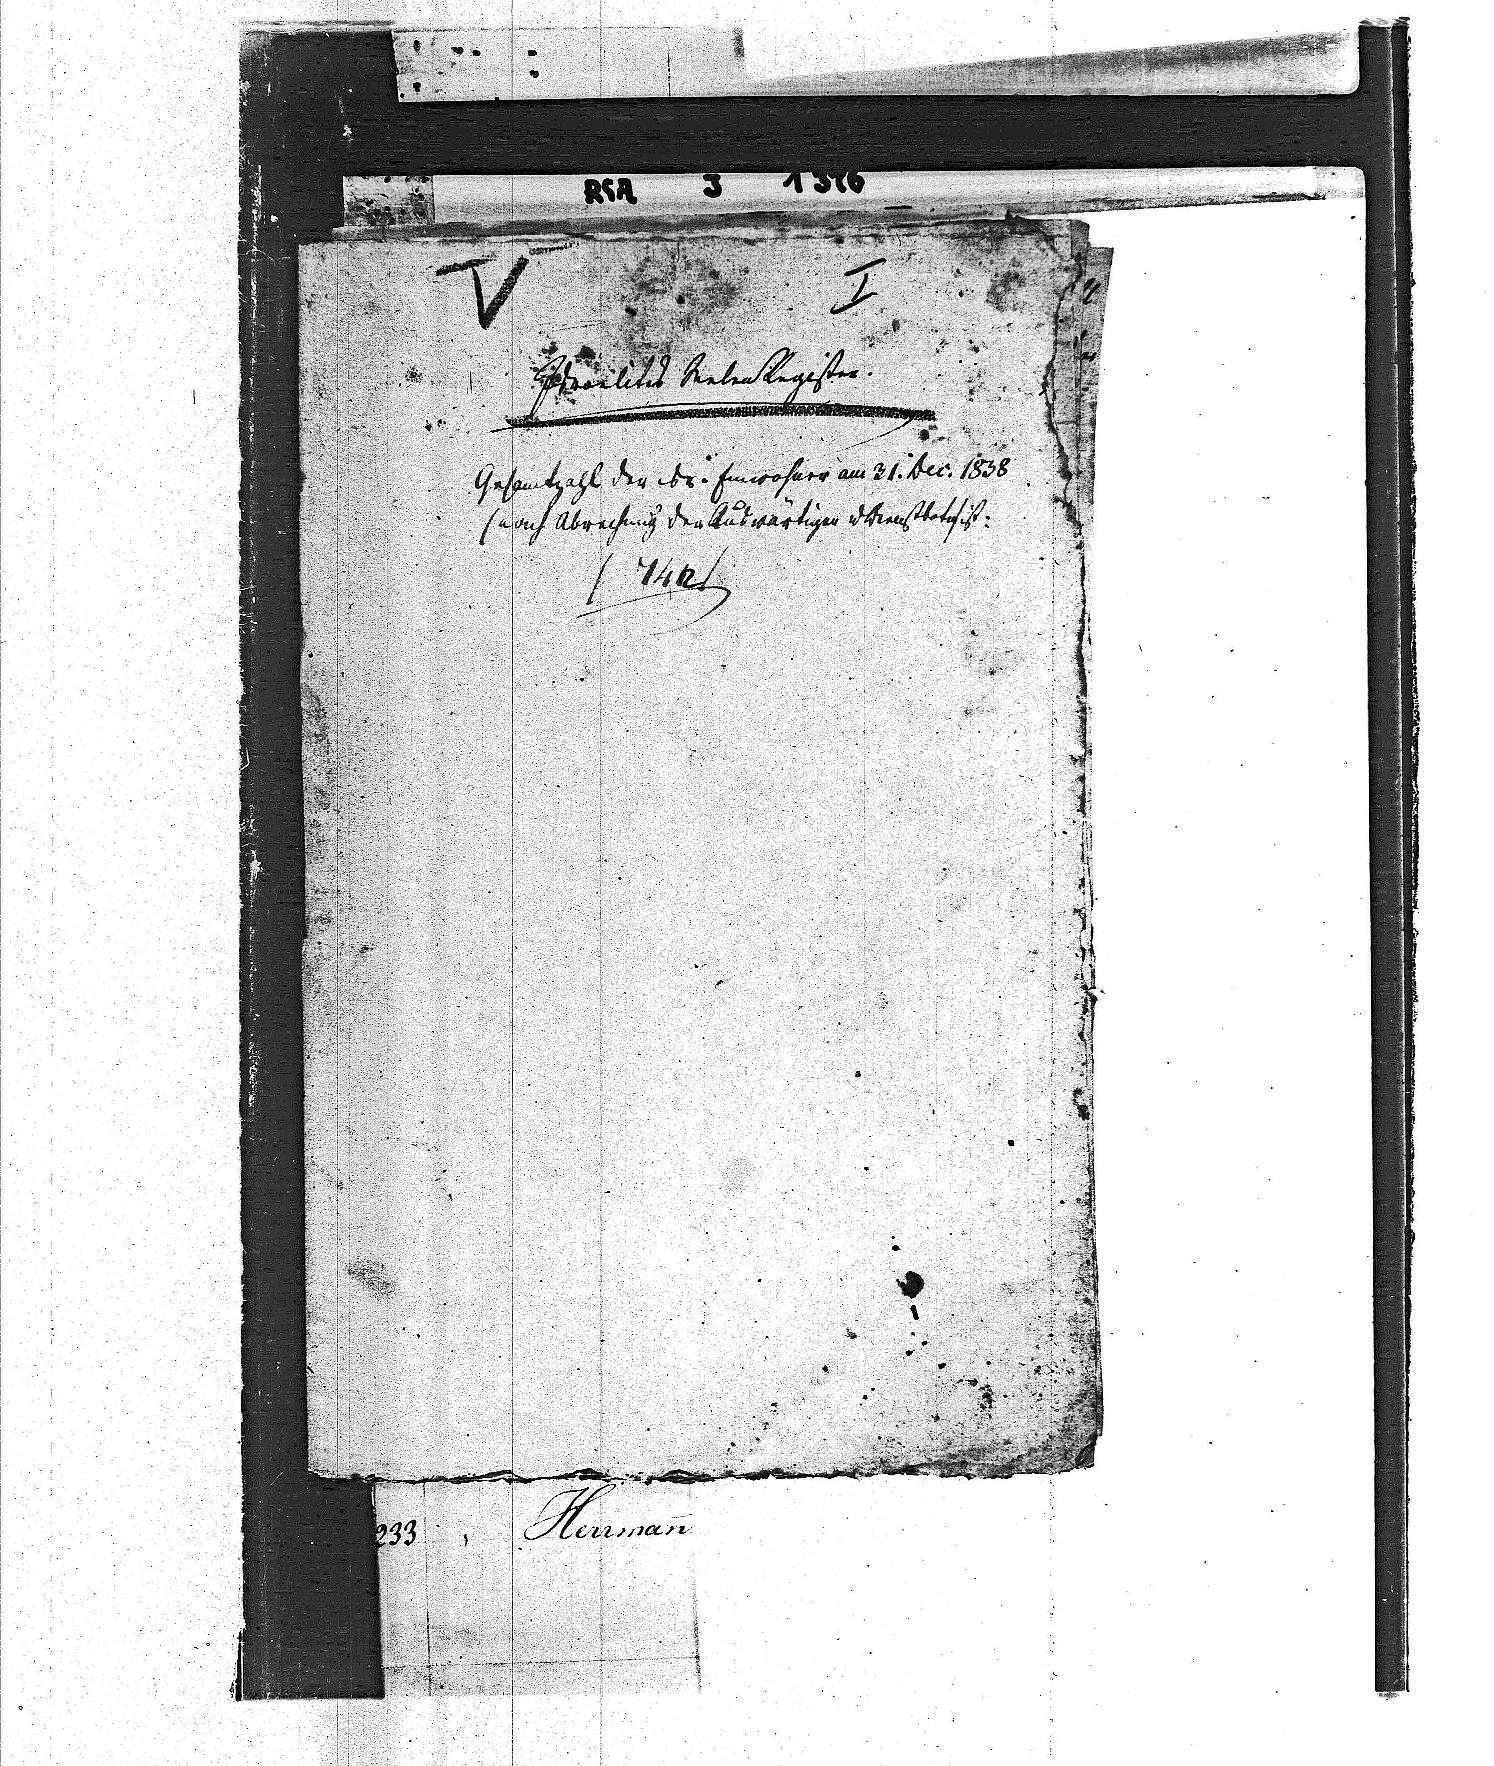 Hechingen, Bild 1